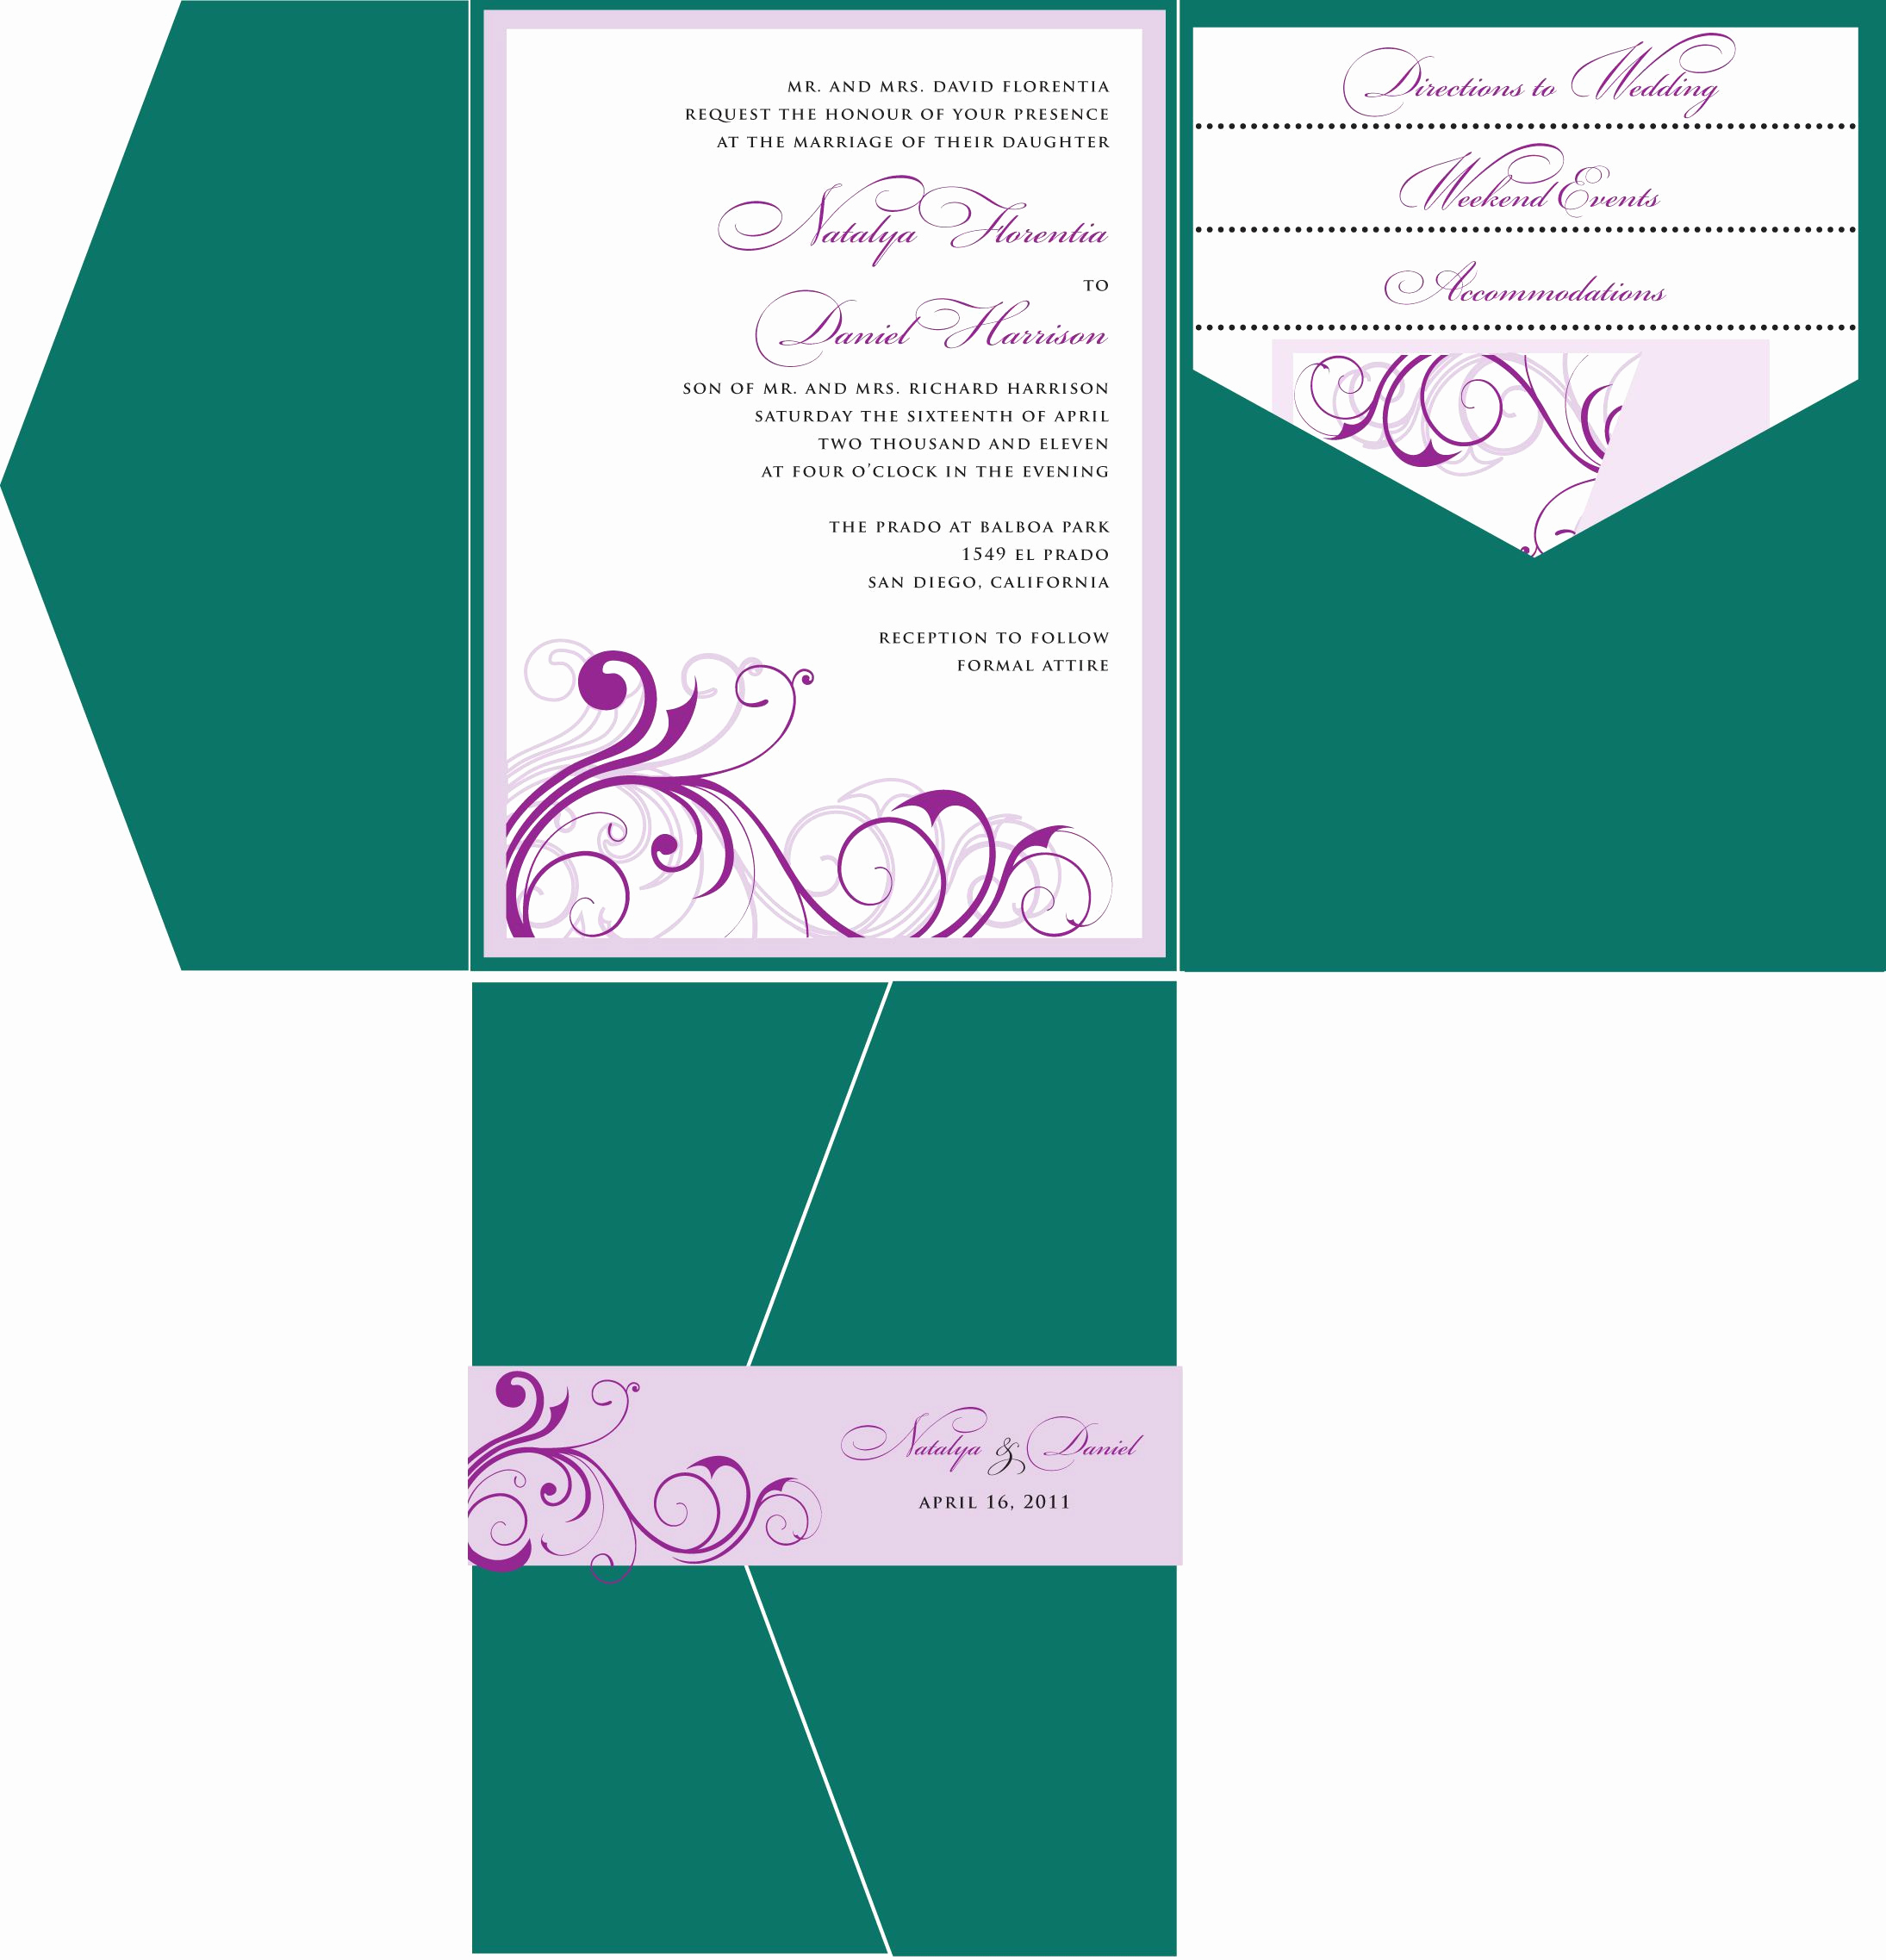 Wedding Invitation Templates Word Inspirational Wedding Invitations Template Wedding Invitations